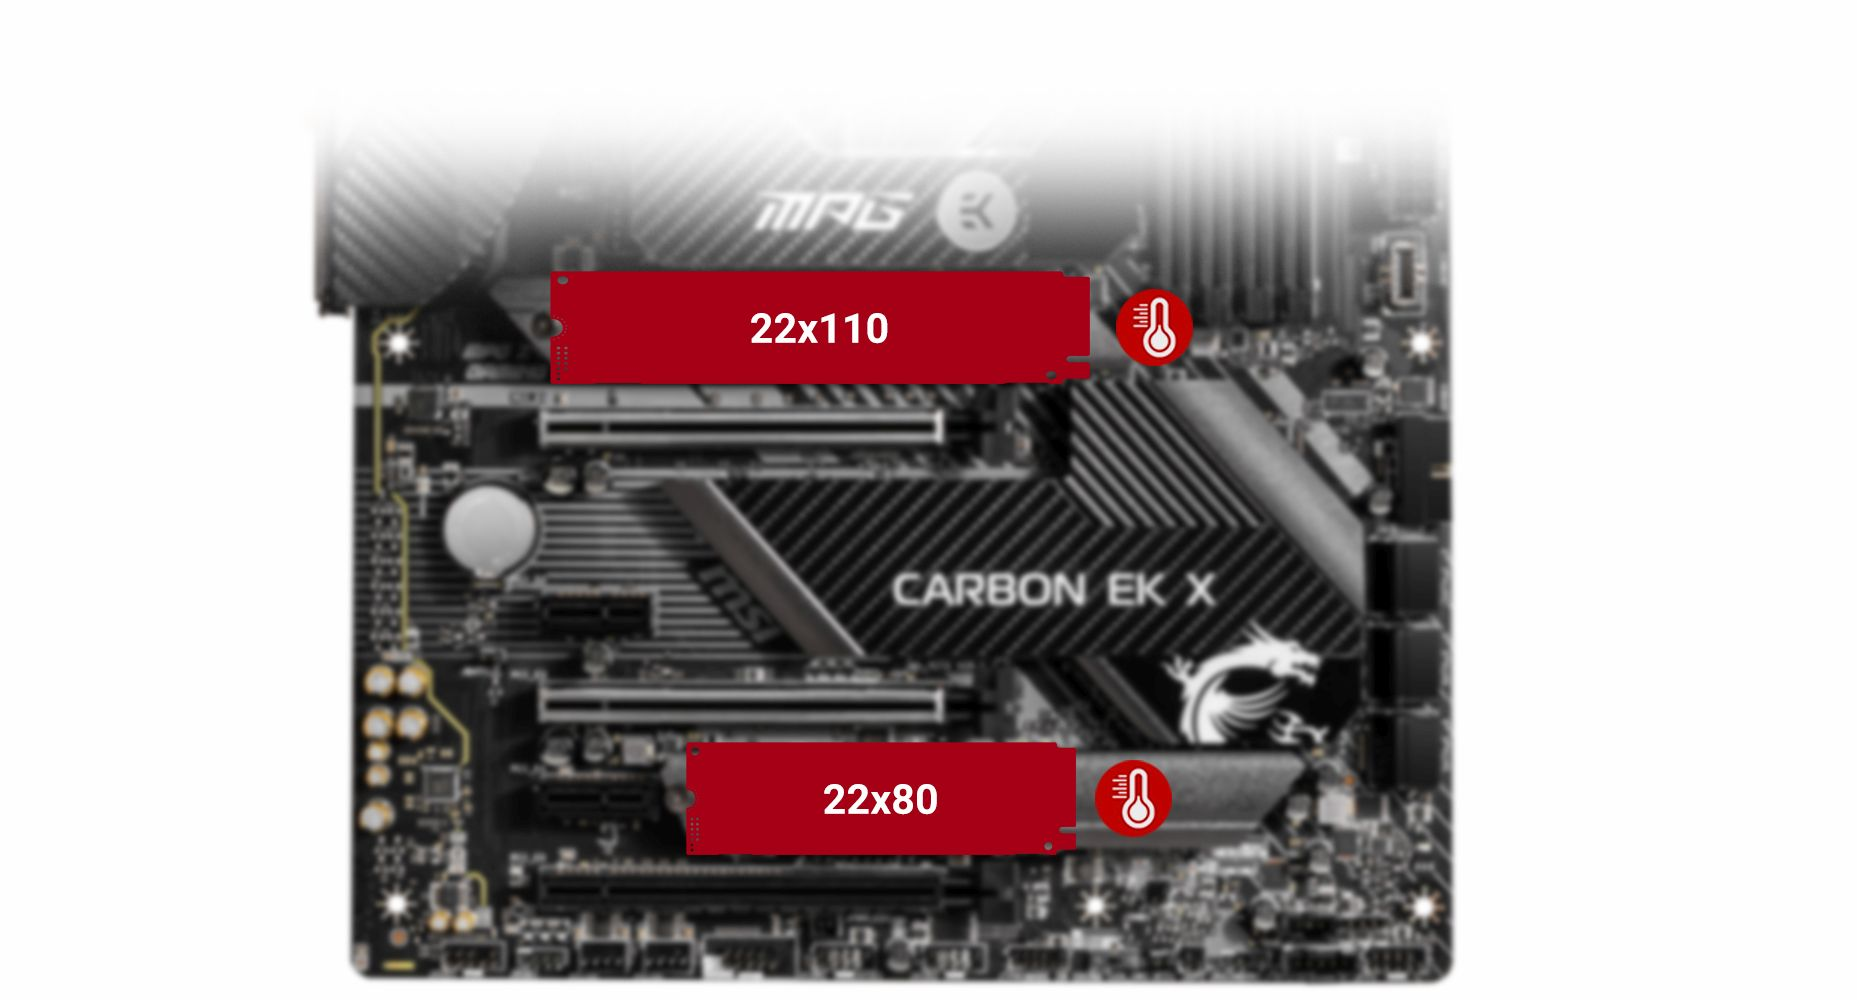 MSI MPG Z490 CARBON EK X TWIN TURBO M.2 and M.2 SHIELD FROZR